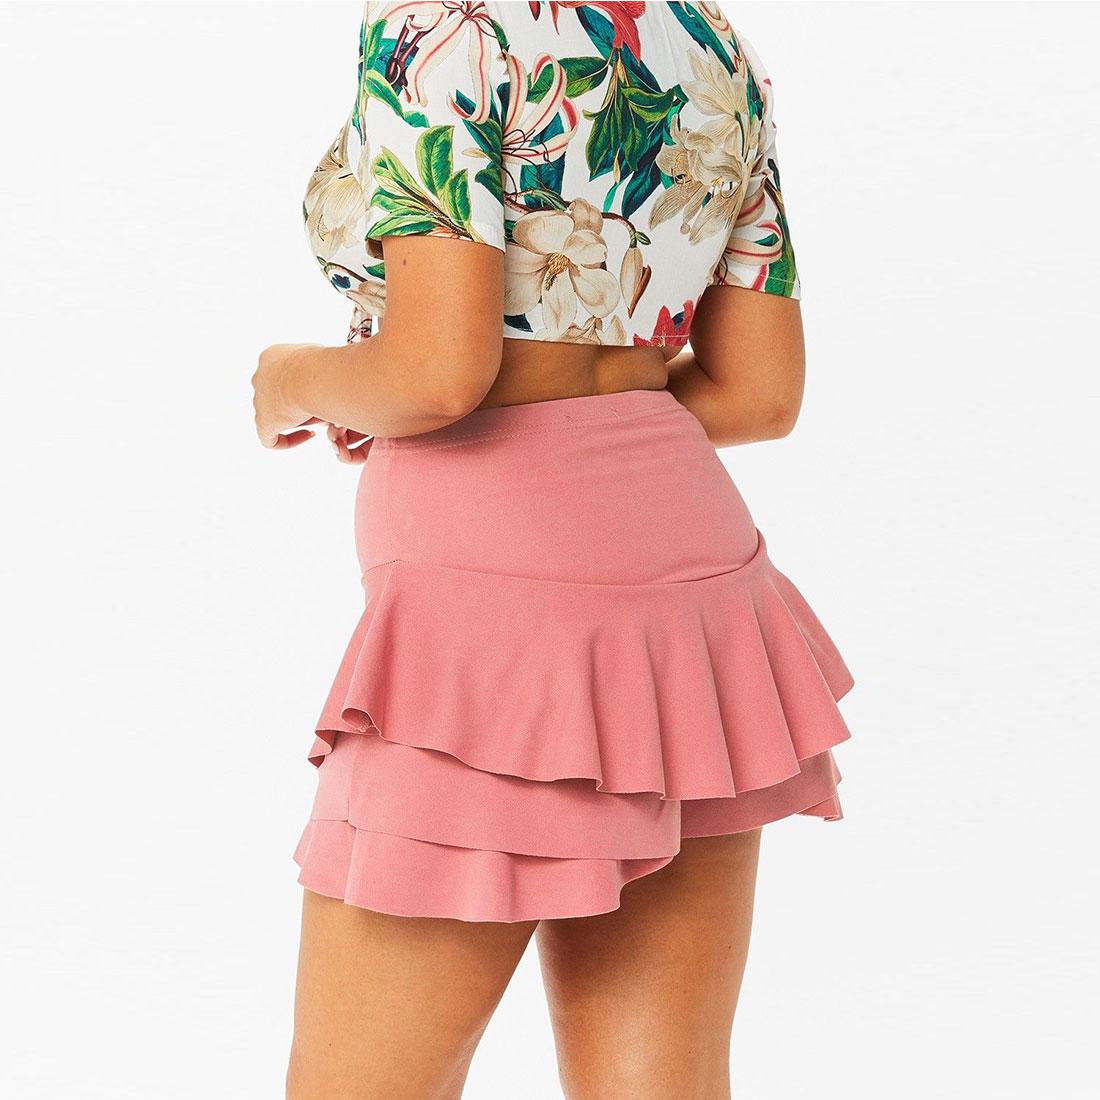 Comfortable Women Casual Fashion Sexy High Waist Ruffles   Shorts   Skirts Bottoms   Shorts